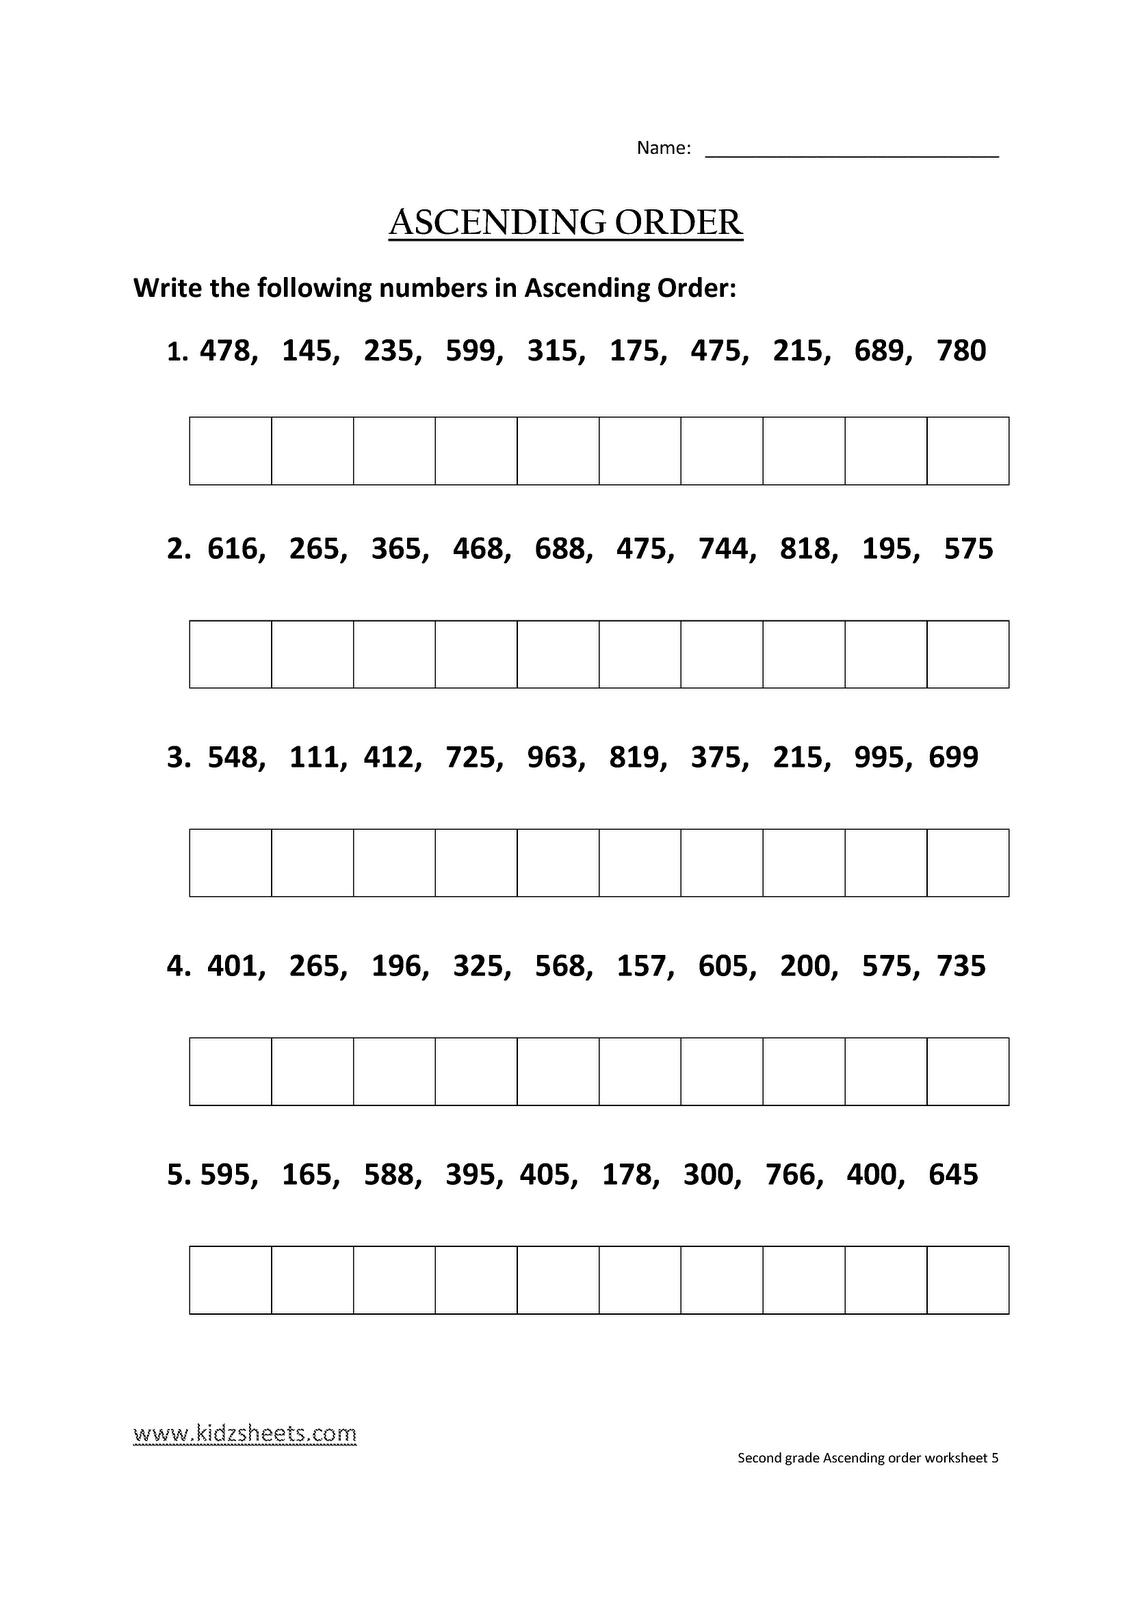 hight resolution of Kindergarten Math Ascending Order Worksheets - Preschool Worksheet Gallery